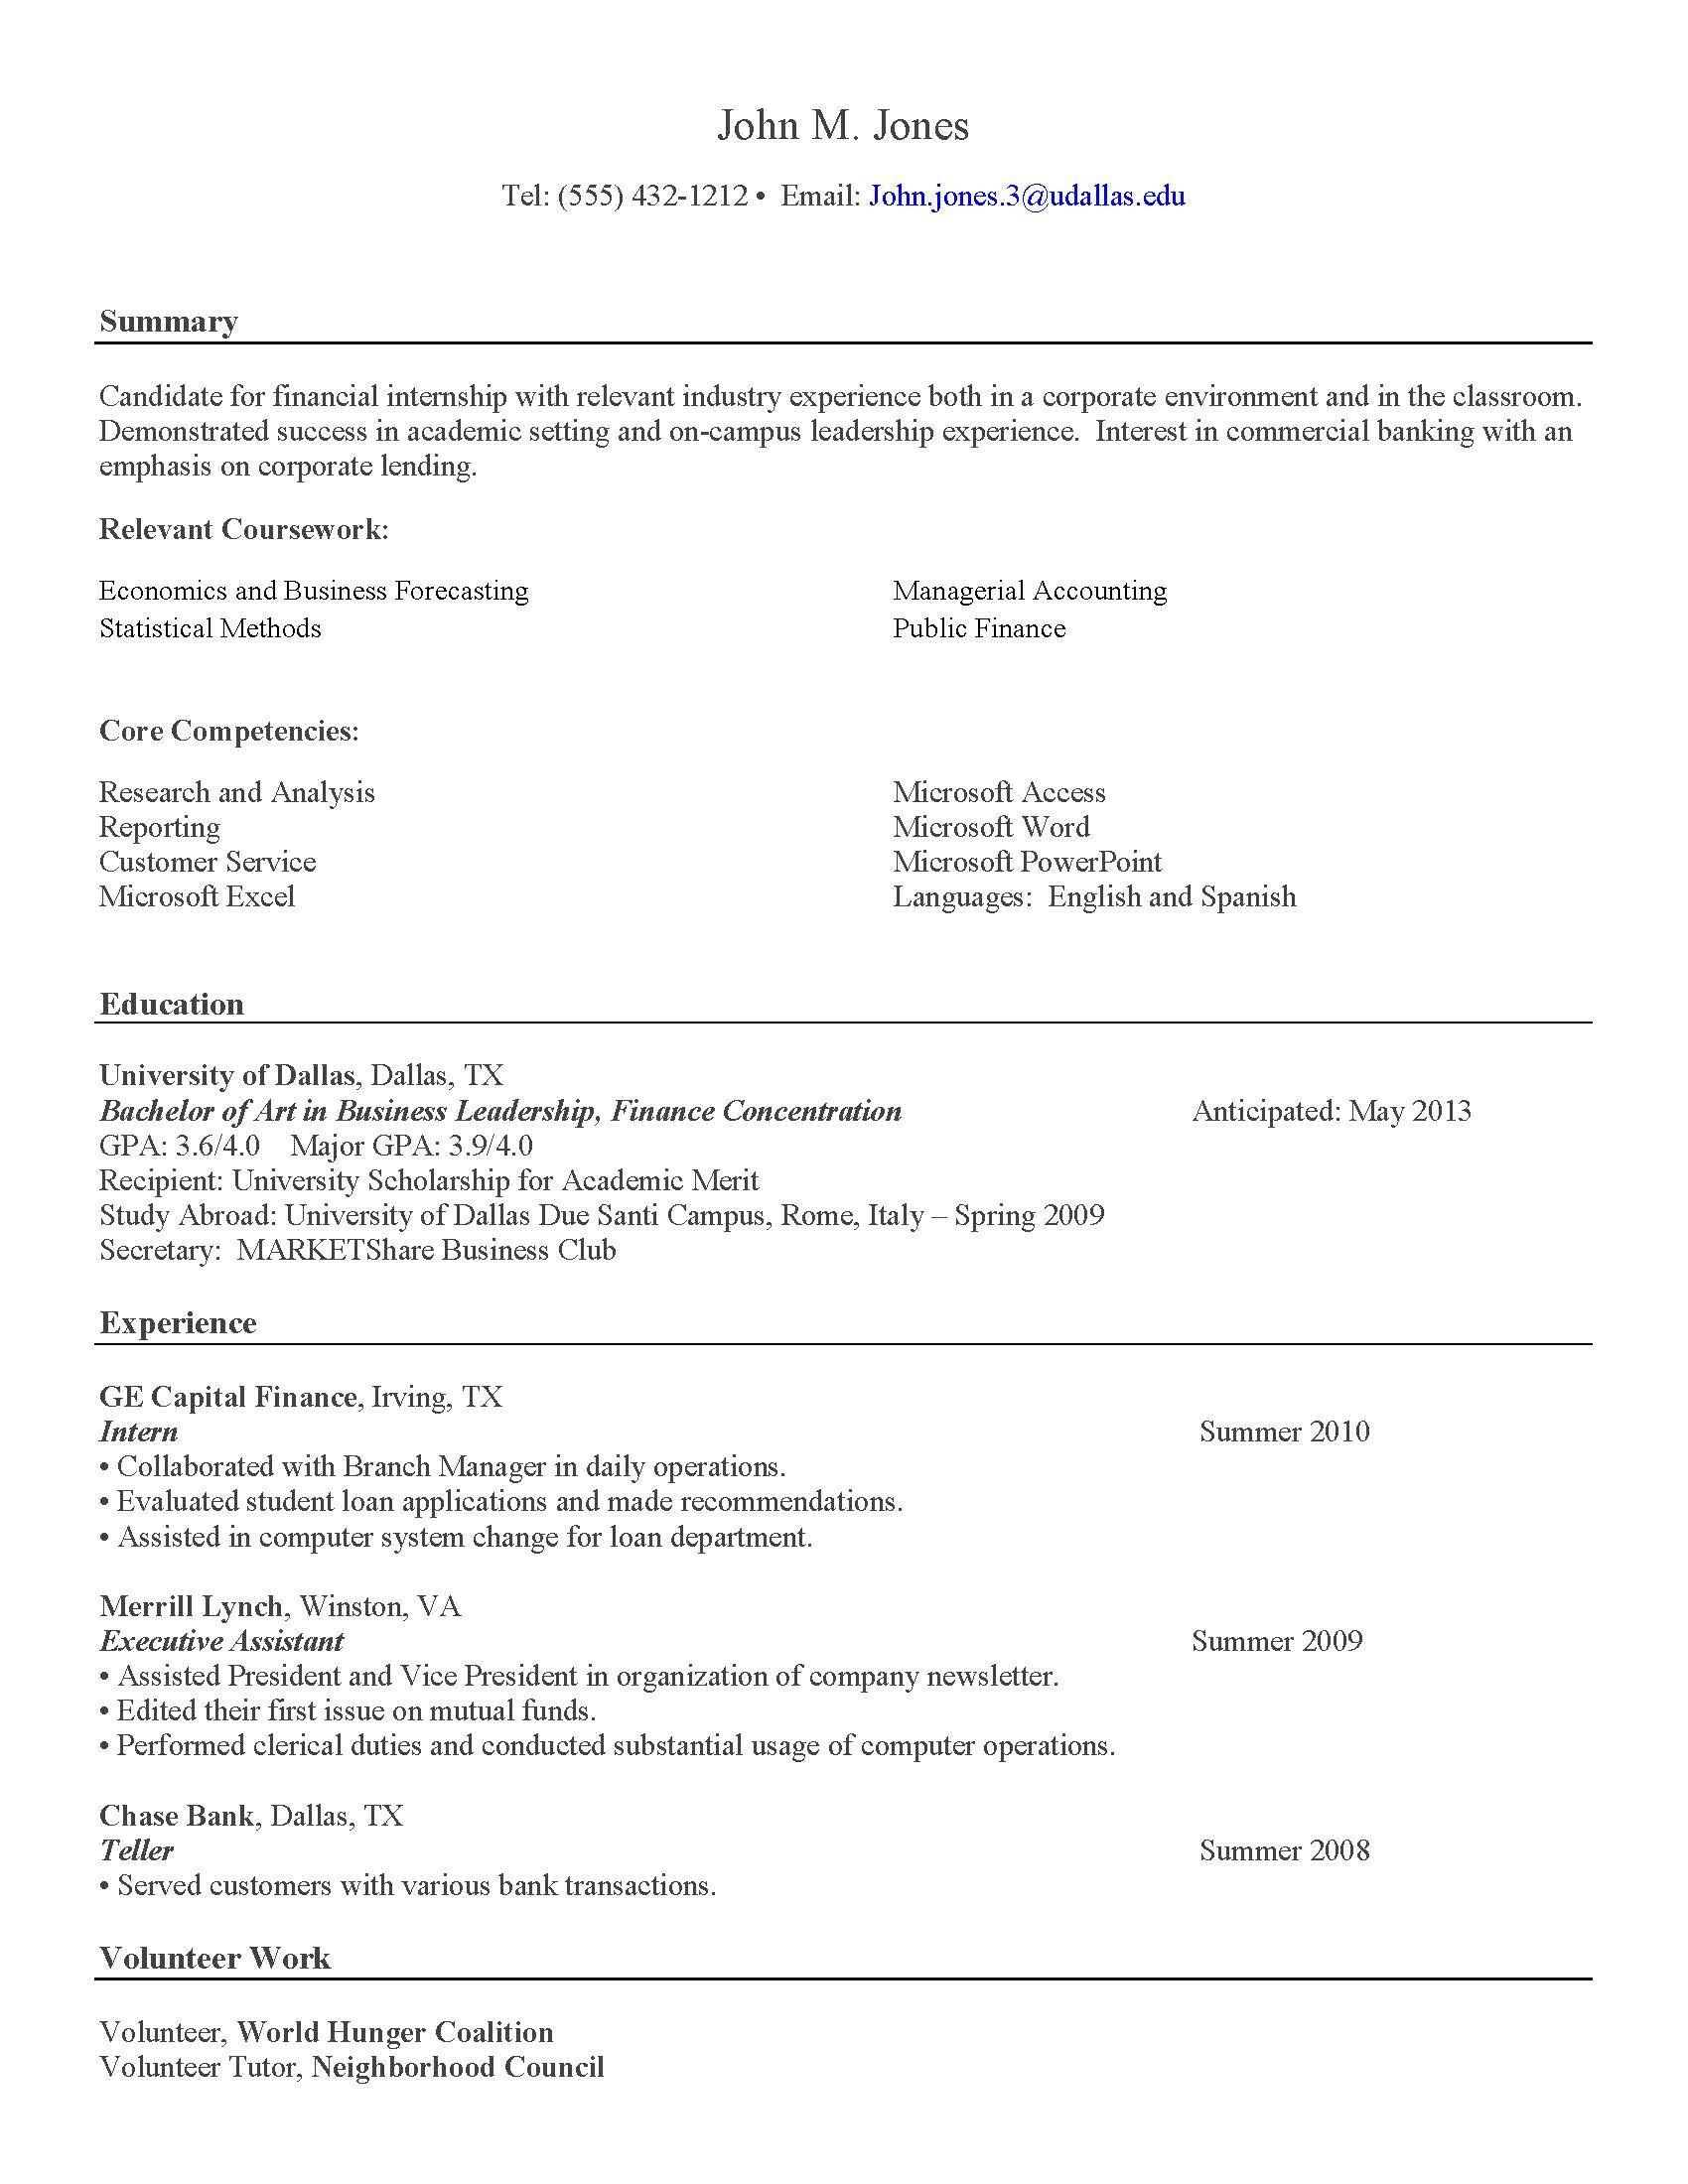 Letter Chronological Resume Sample And Format Letter Sample Lettersampl Xyz Chronological Resume Functional Resume Template Functional Resume